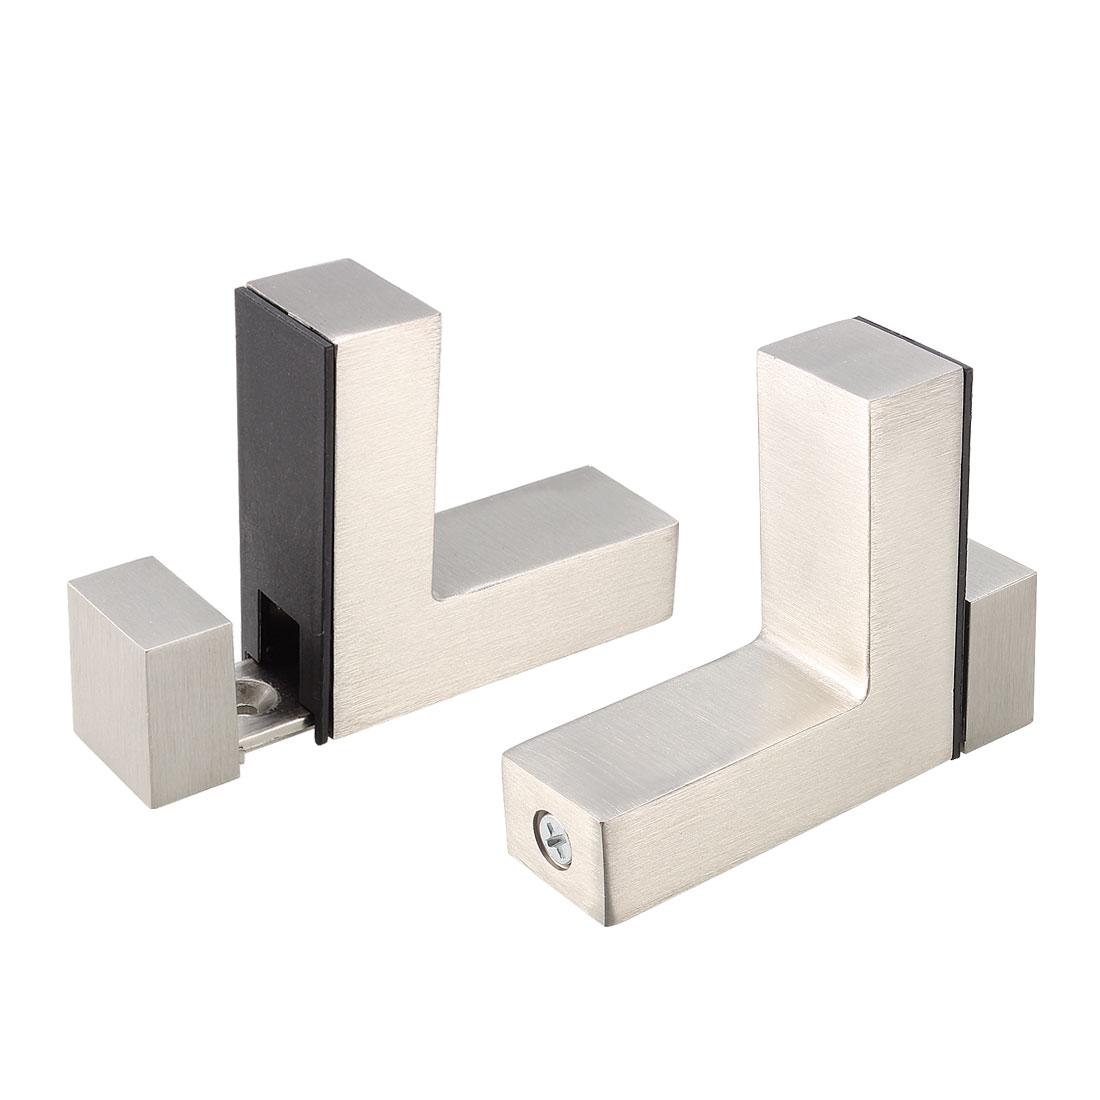 Stainless Steel L Shaped Glass Shelf Clip Clamp Bracket 2pcs